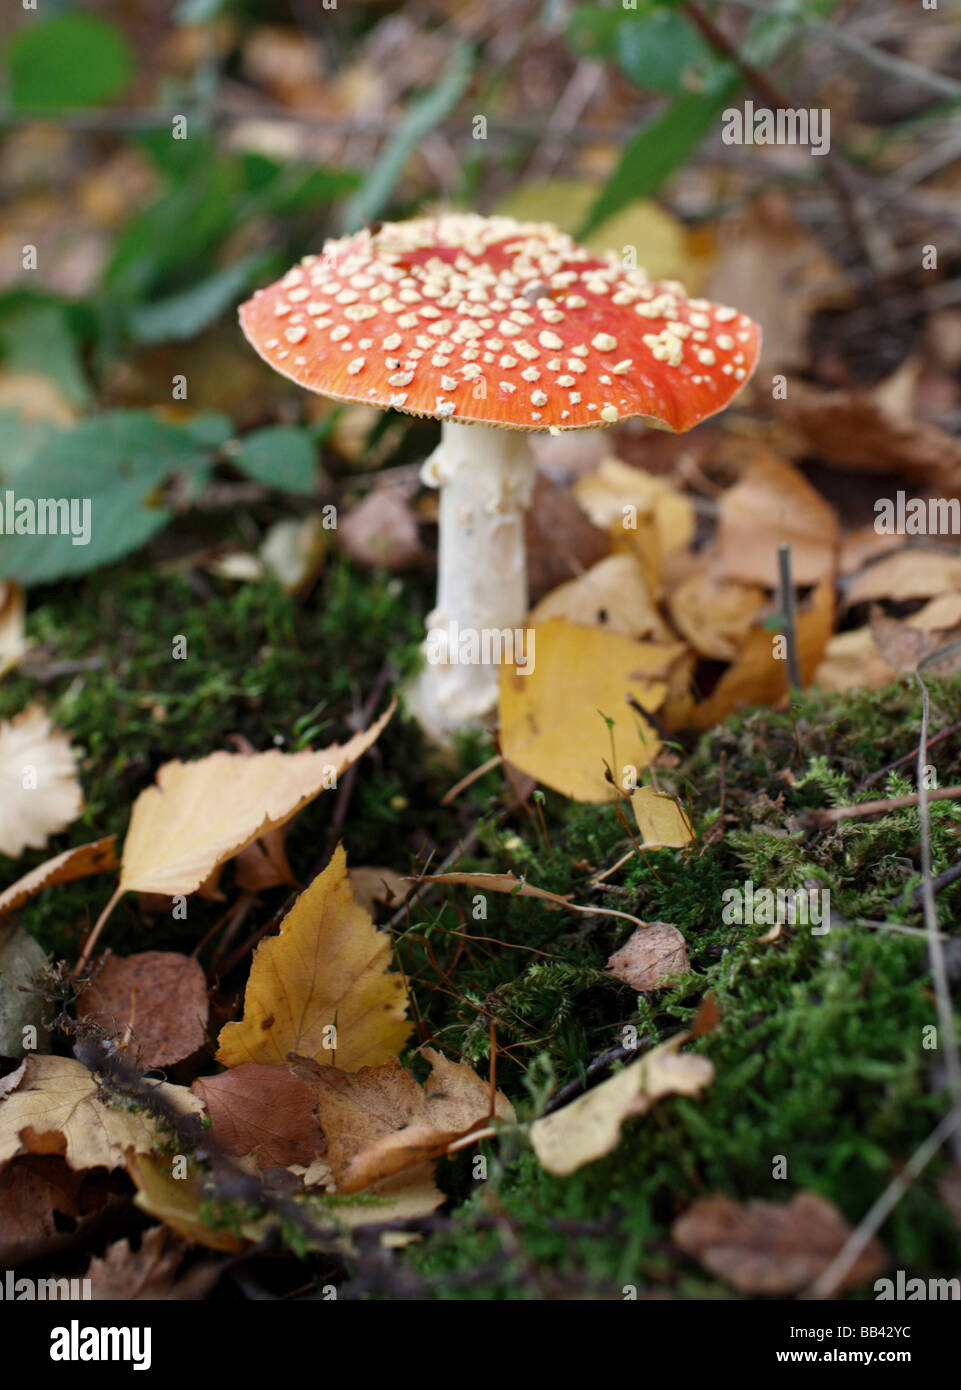 Amanita muscaria - Stock Image